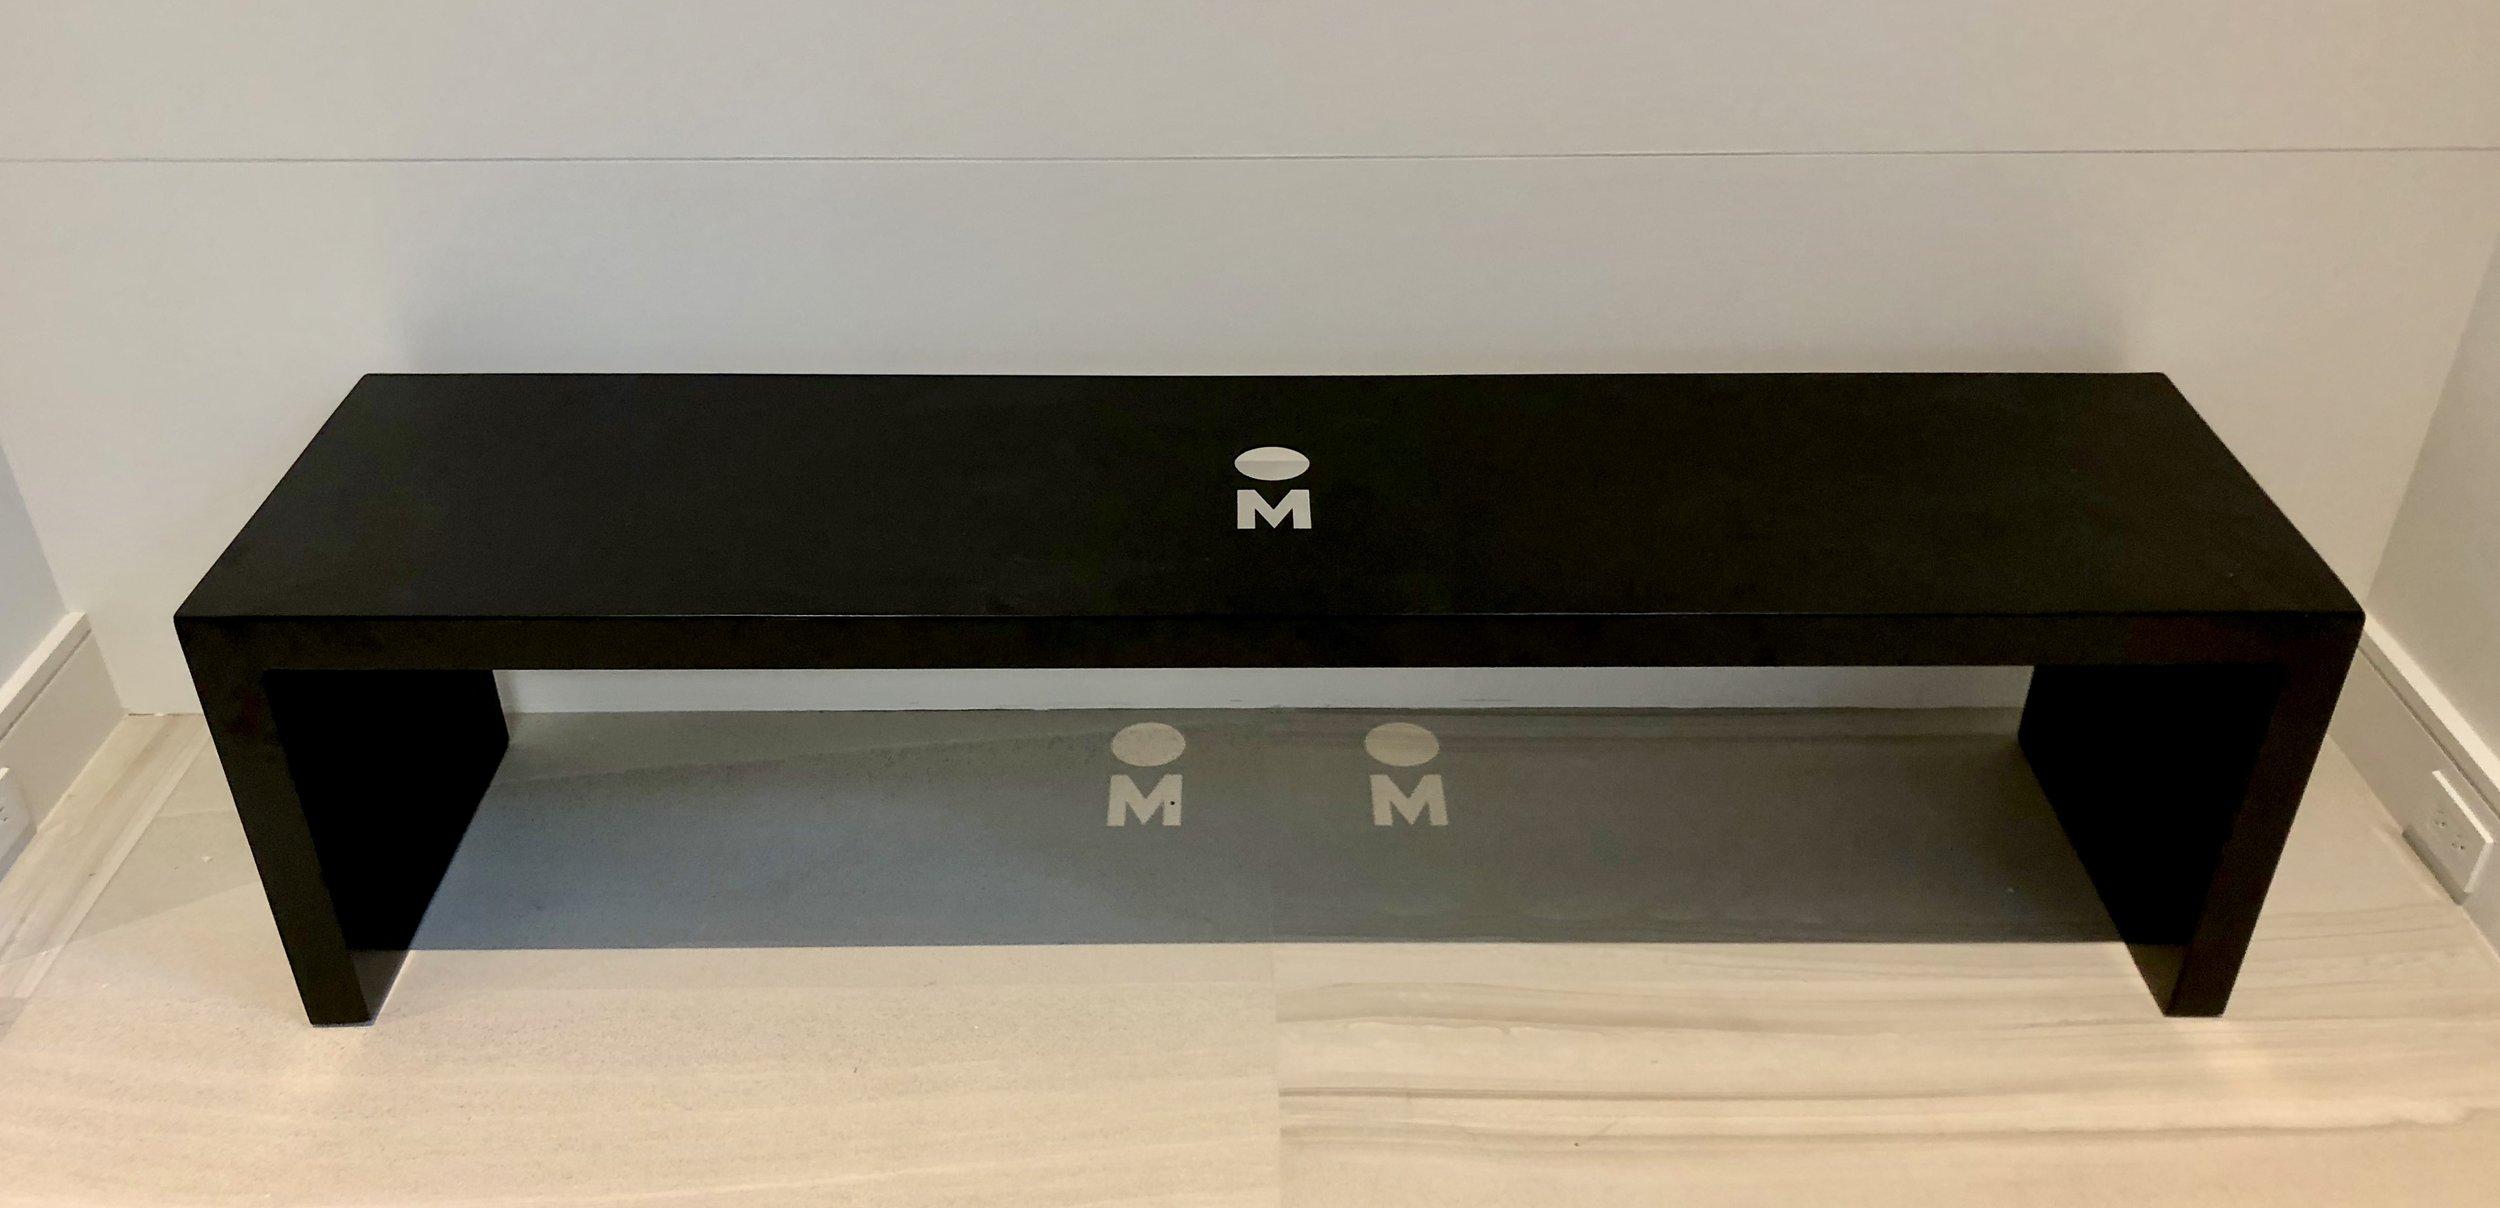 Modern-Day Interpretation of a Meditation Bench :  $5000.